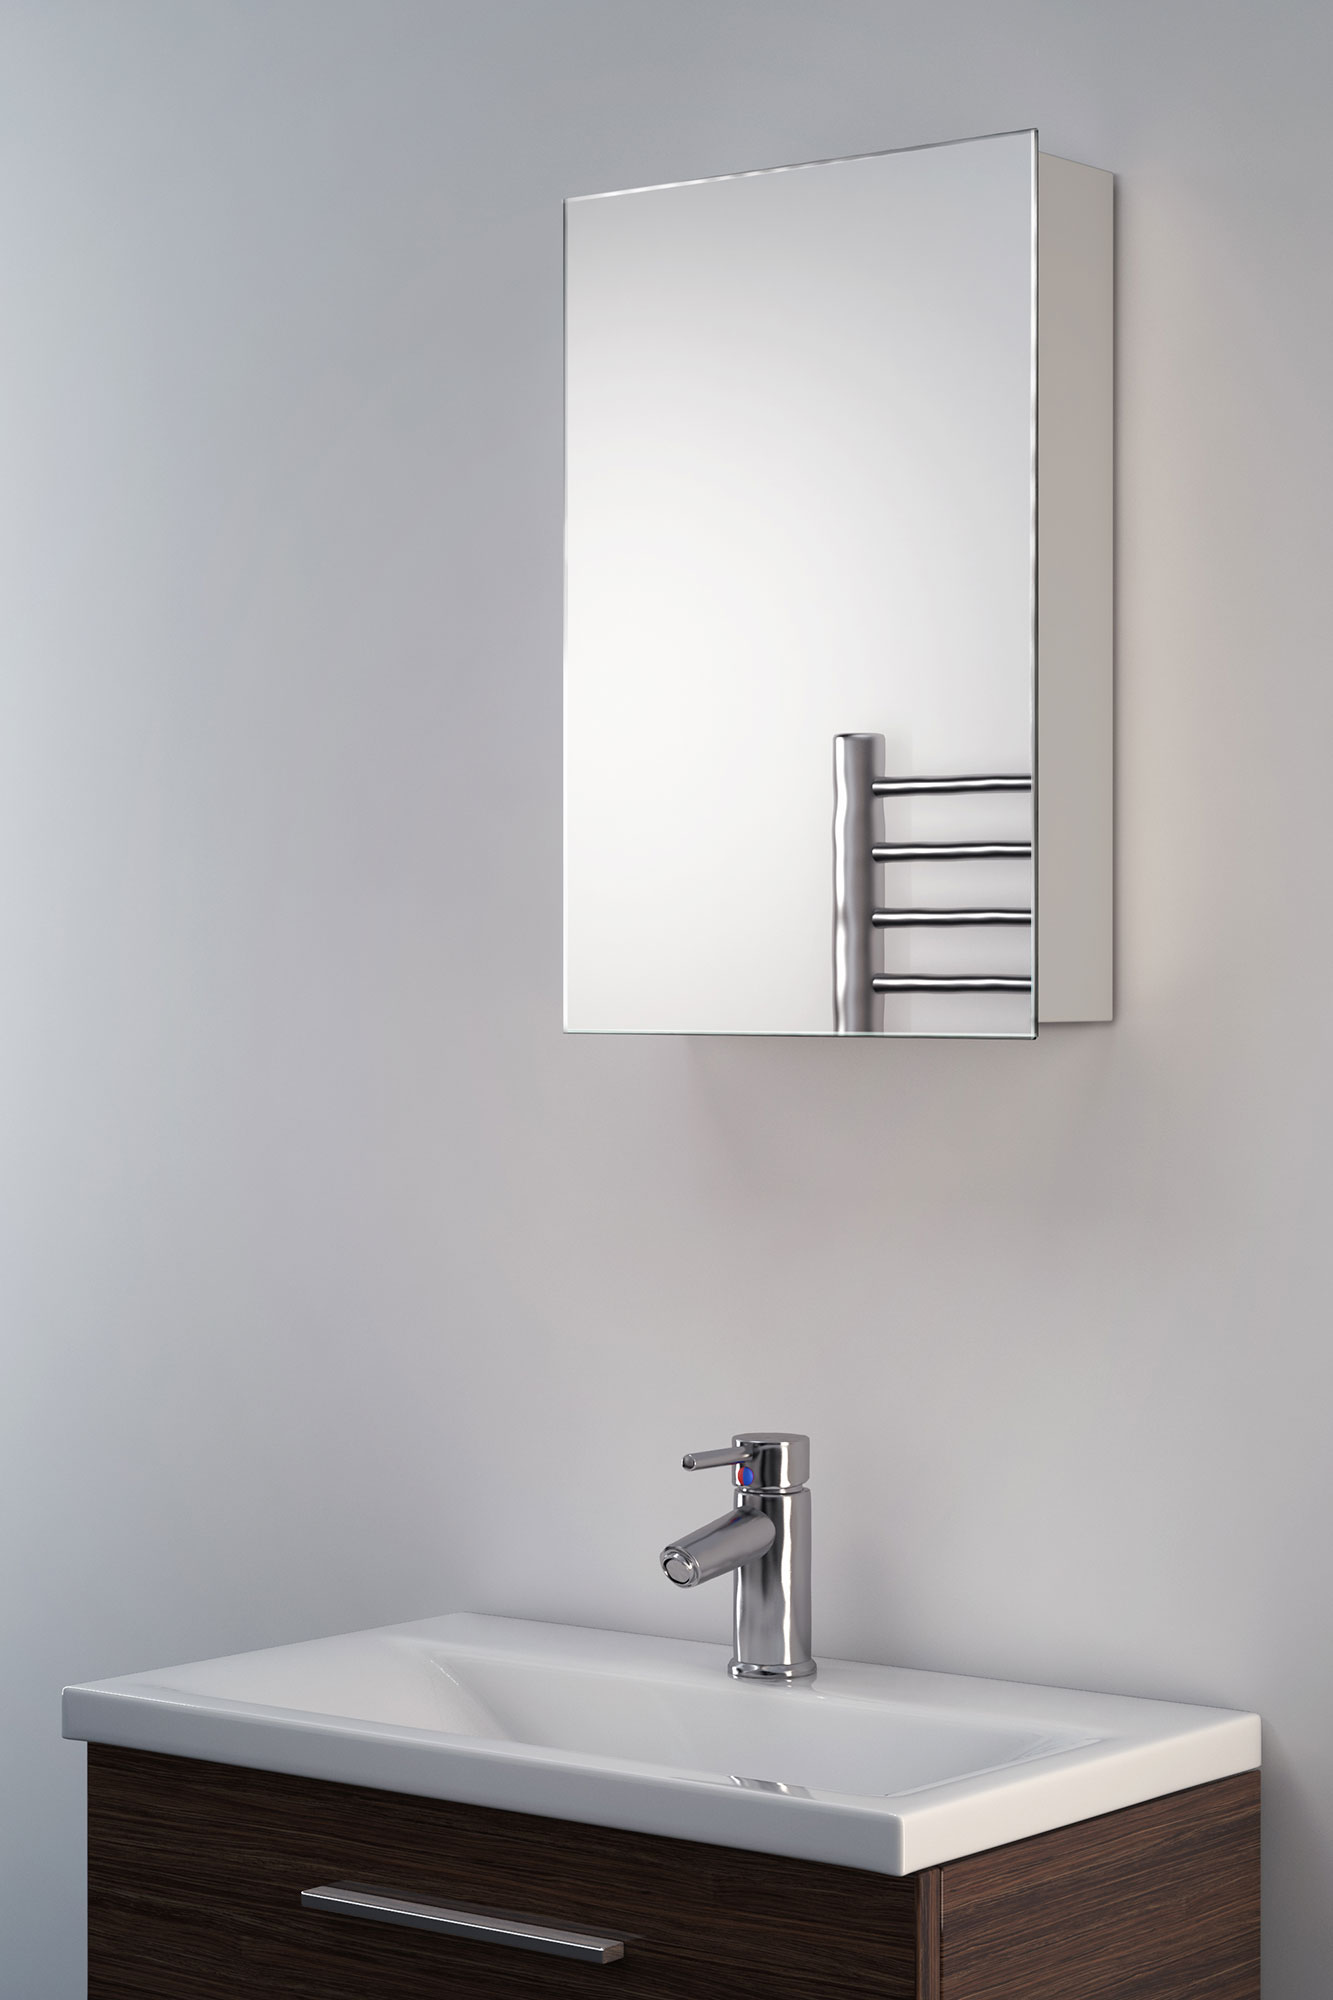 Bathroom Mirrors Illuminated: Alban Non-Illuminated Bathroom Mirror Cabinet K136